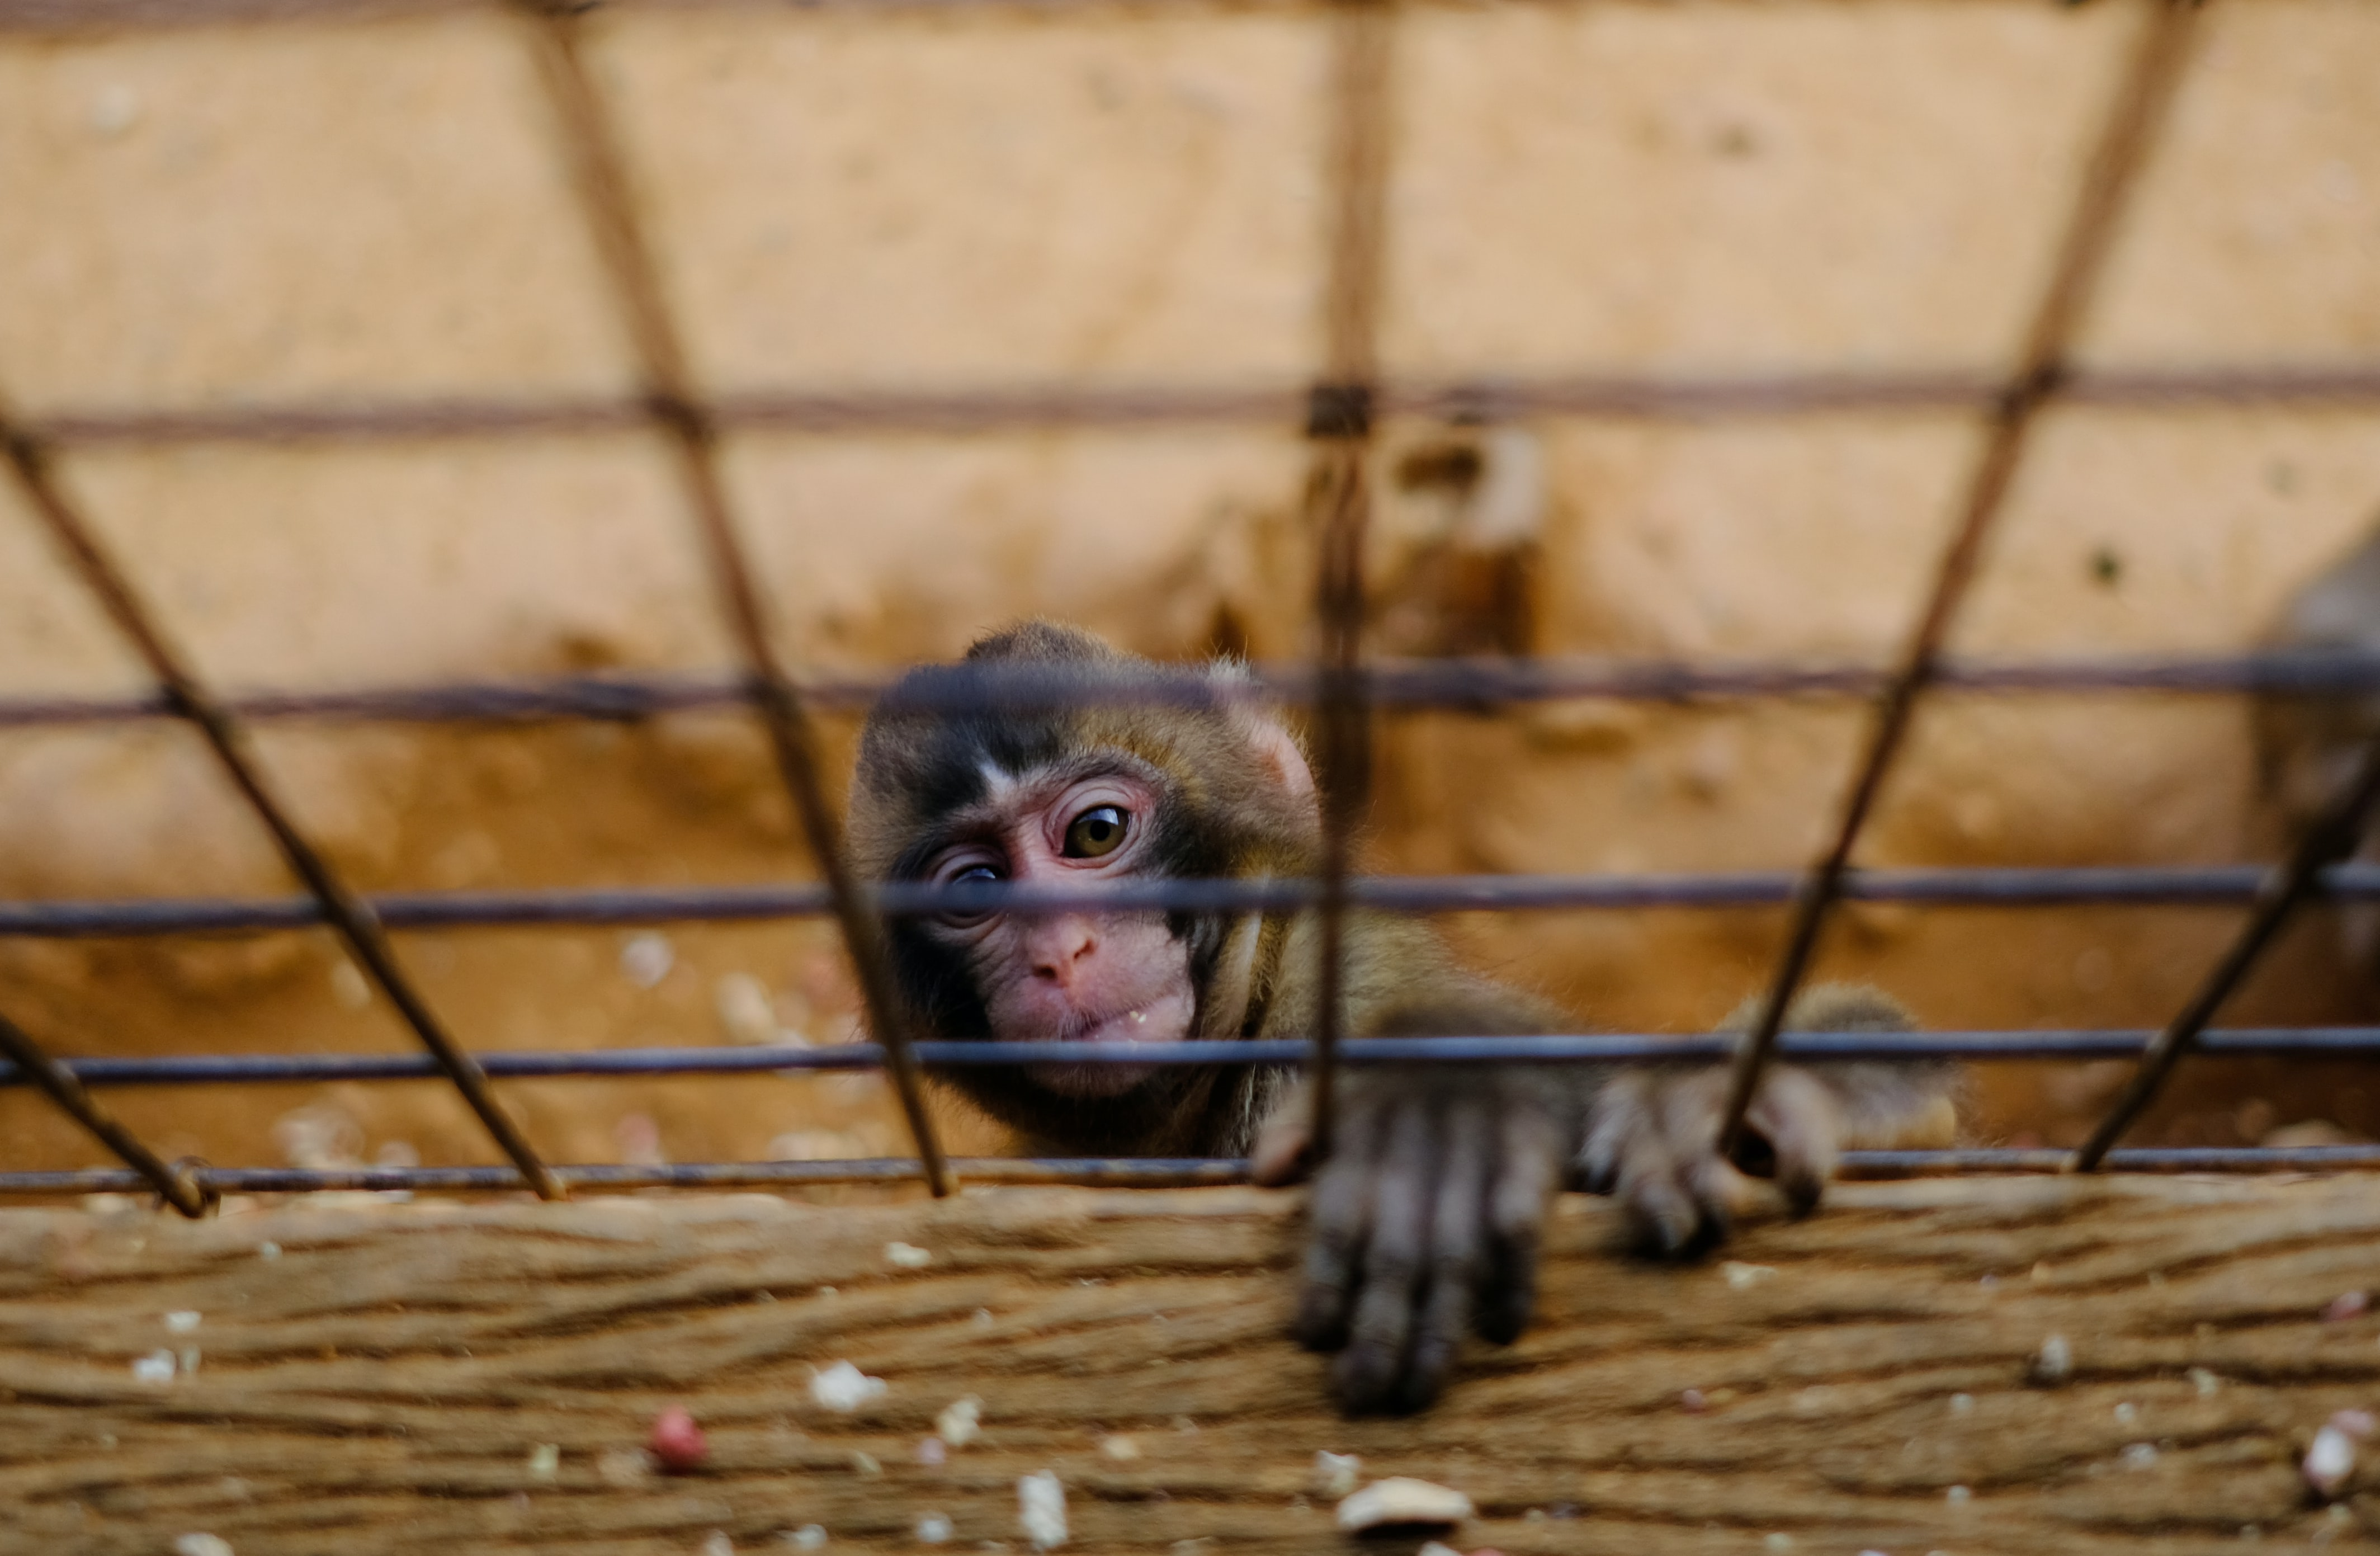 monkey climbing on cage